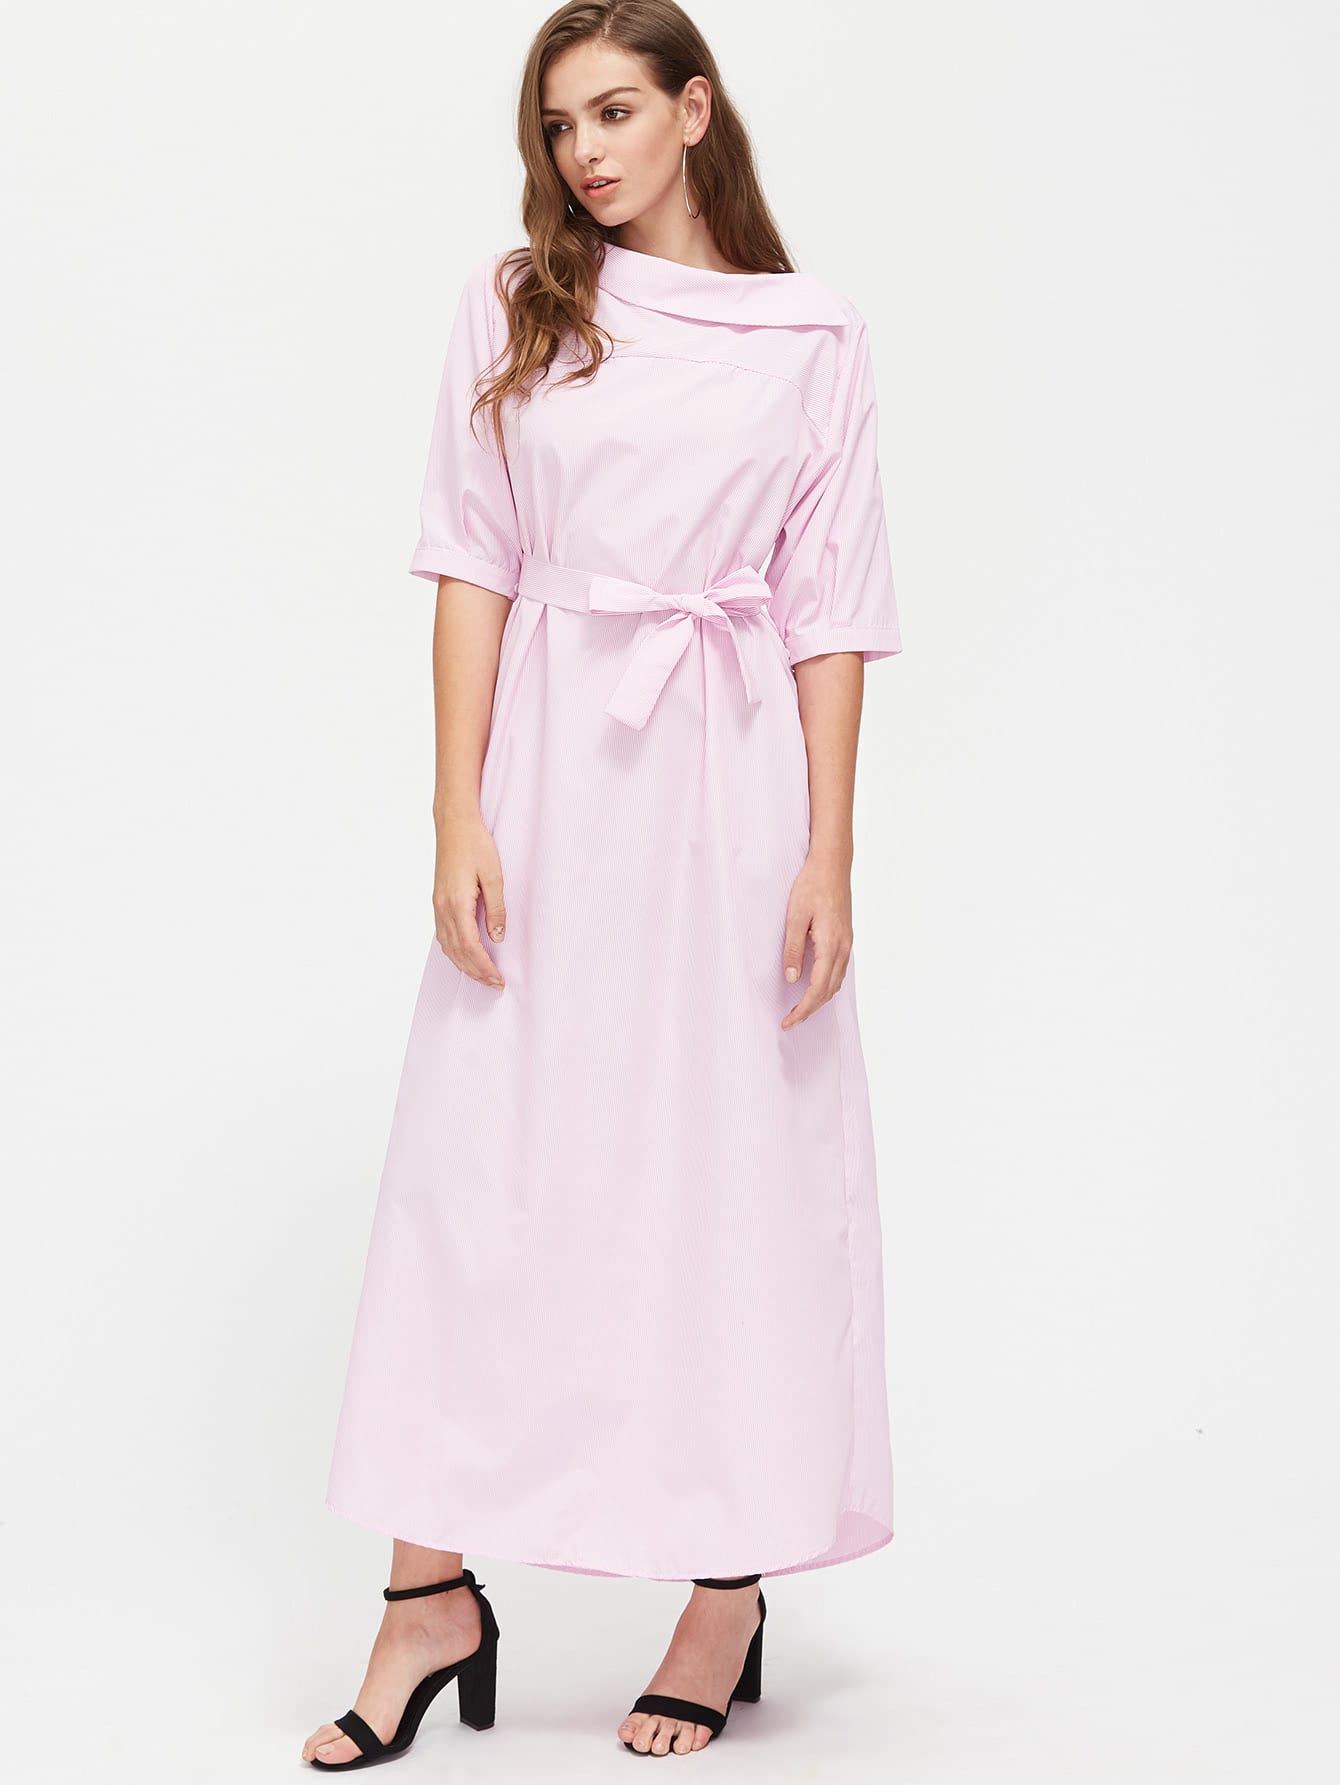 1a39a3194b65 Pinstripe Asymmetrical Off Shoulder Self Tie Dress